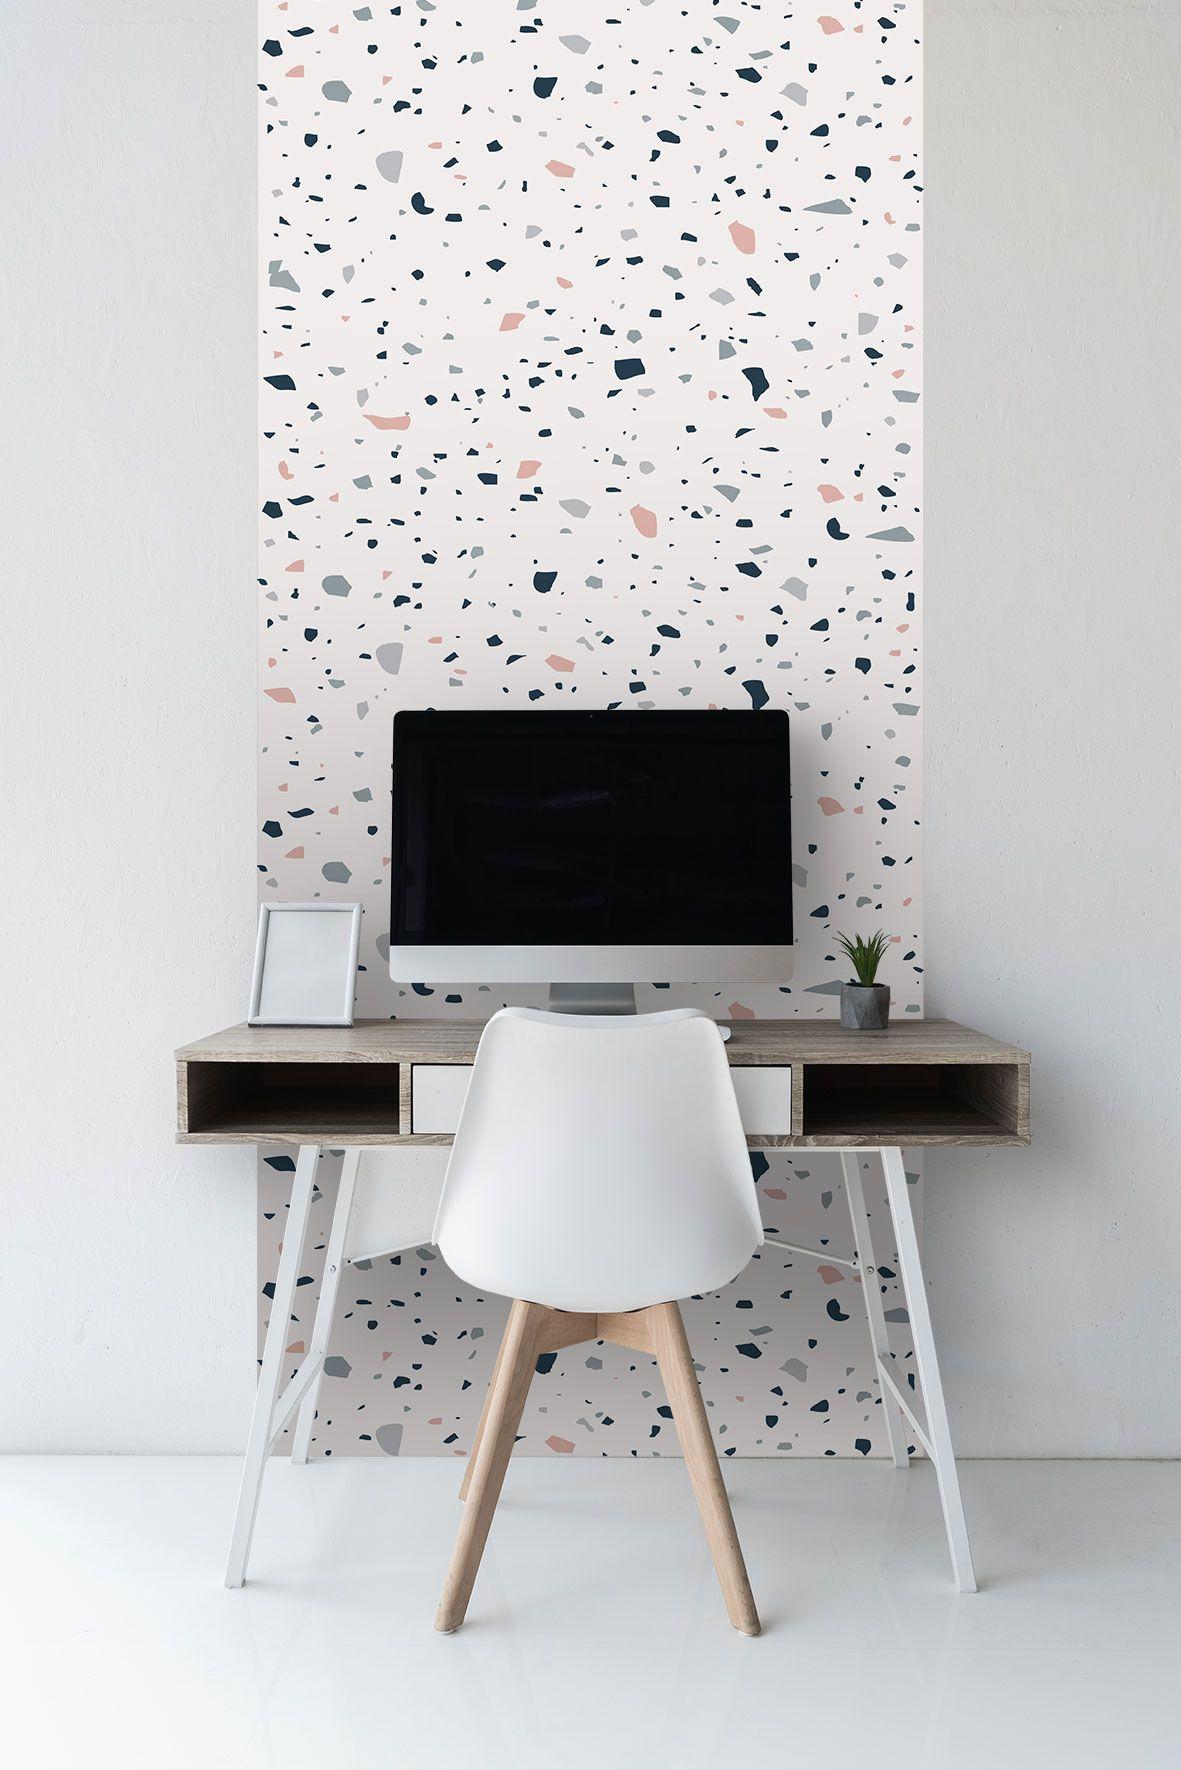 Sticker Wallpaper Easy Diy Apply Paper Free Peel And Stick Selfadhesive Textile Based Wallpaper Terrazzo Easy Diy Home Decor Glass Fridge